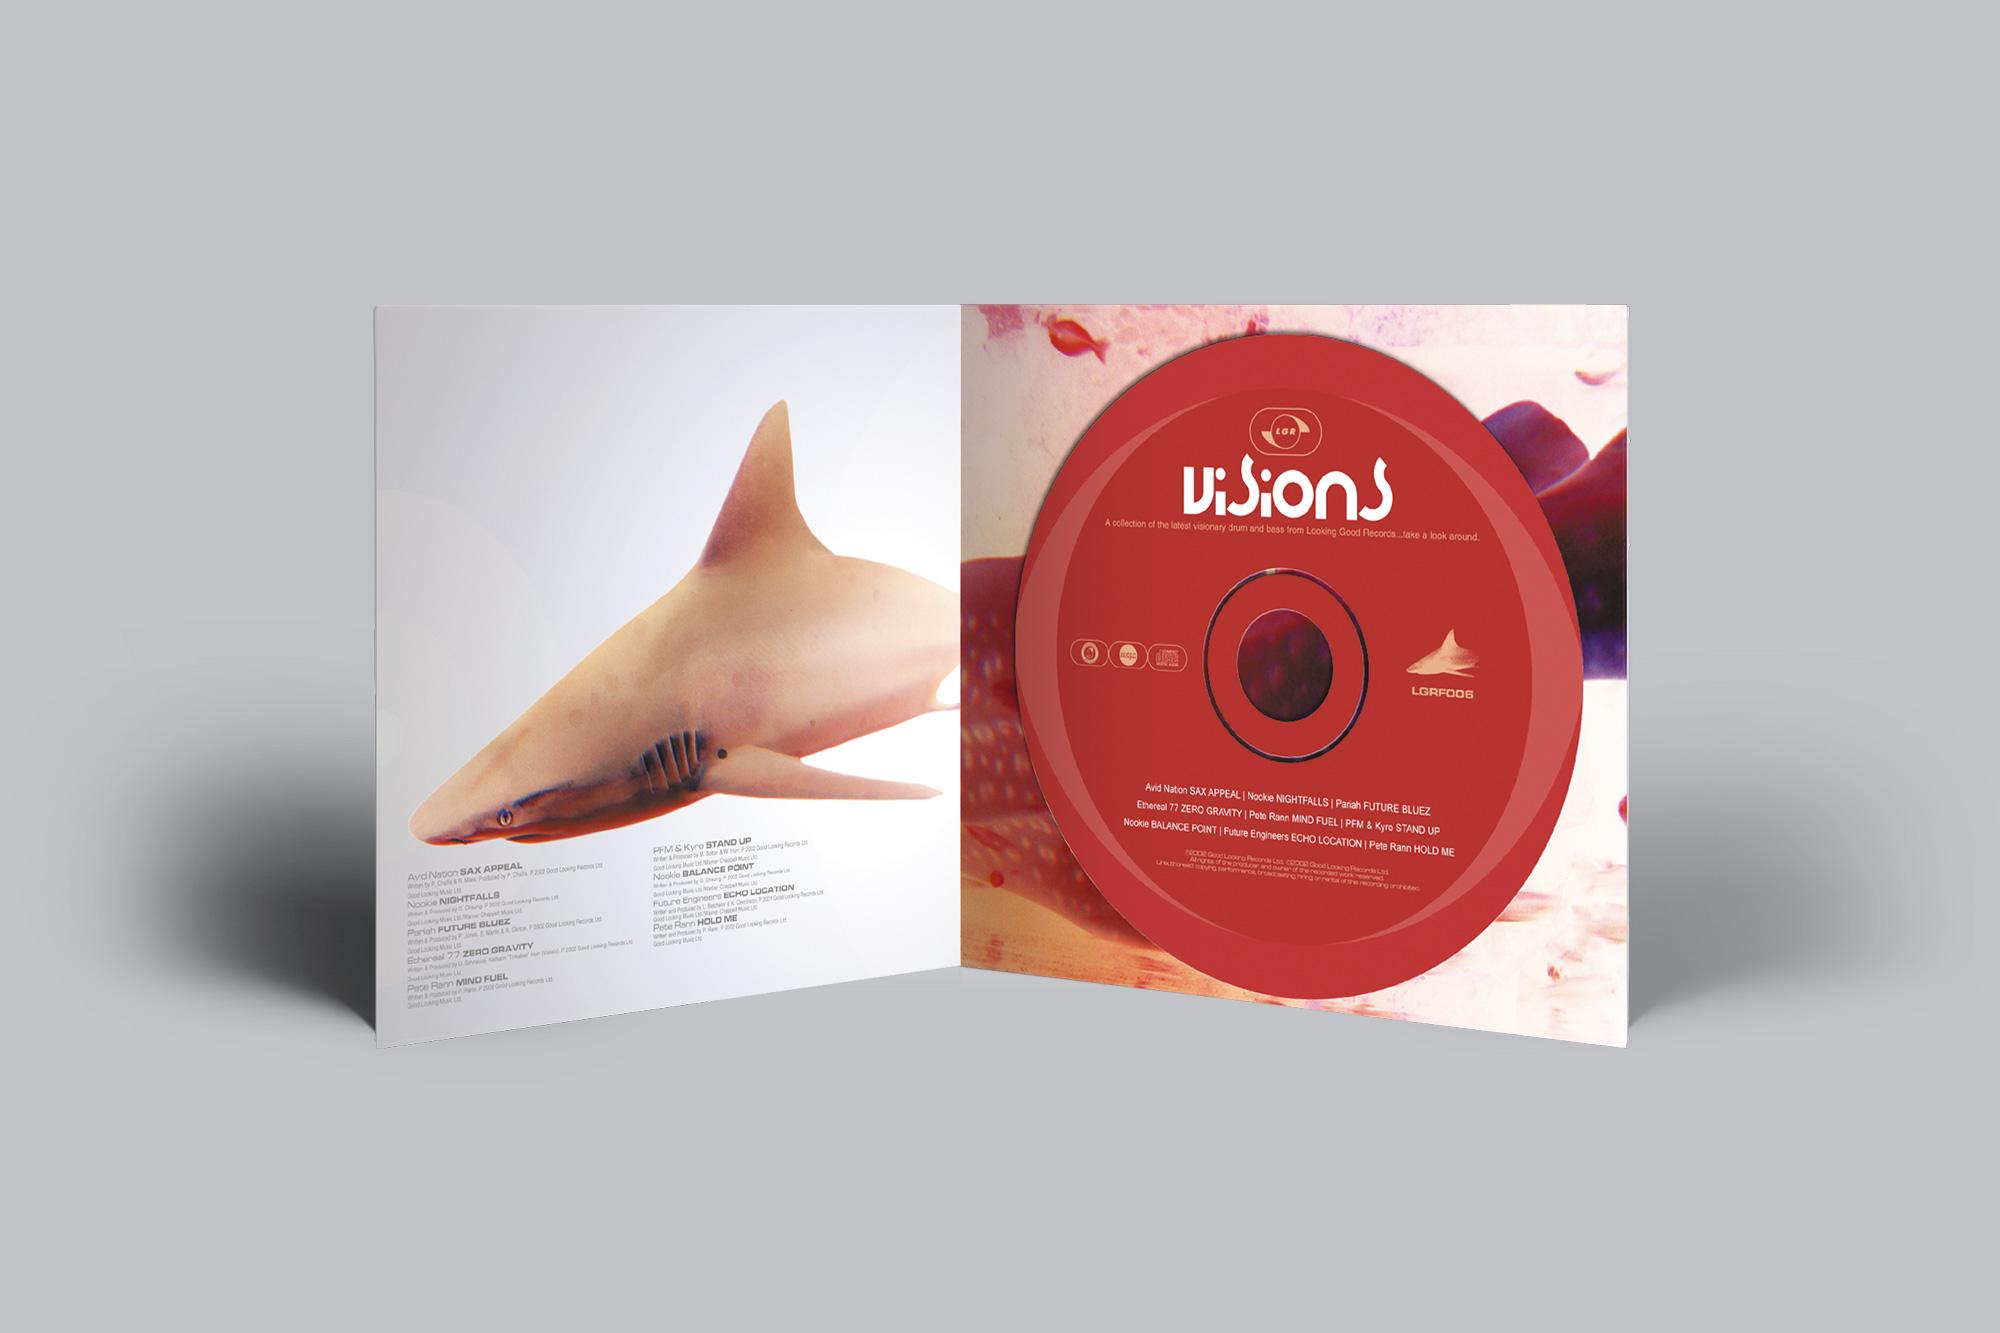 gareth-paul-jones-studio-design-looking-good-records-lp-visions-case-study-05